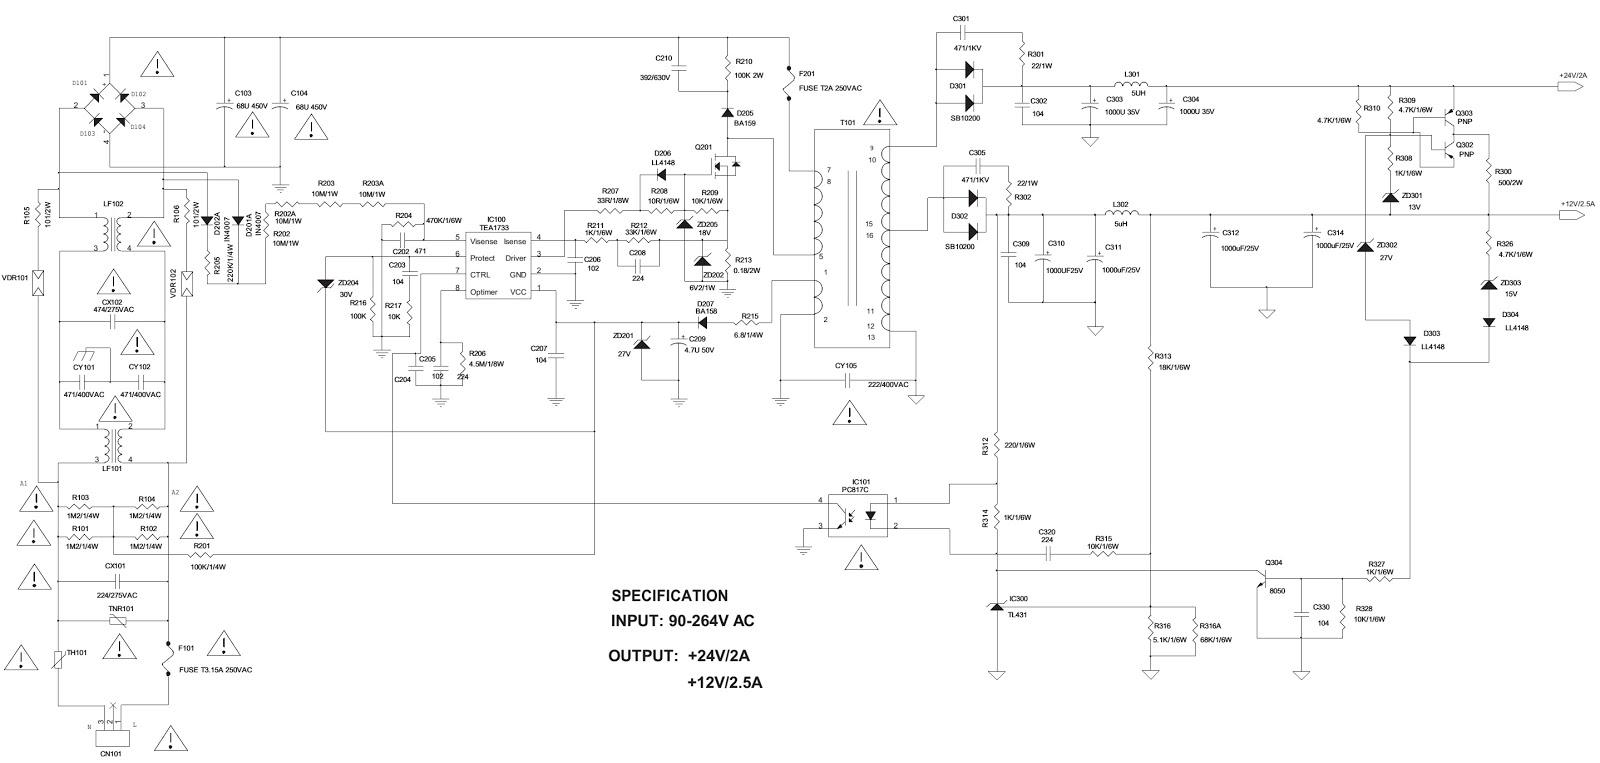 toshiba tv wiring diagrams data diagram schematic toshiba led tv schematic diagram [ 1600 x 763 Pixel ]